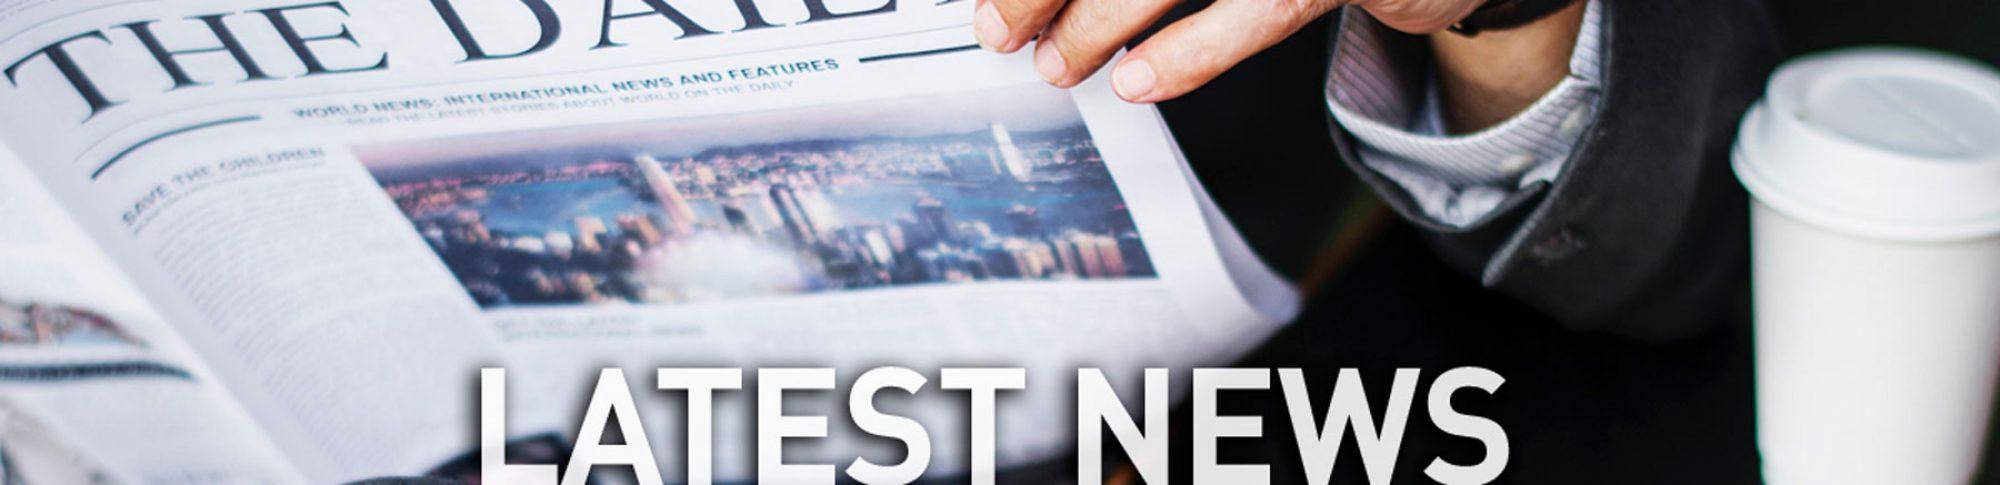 featured_image_latestnews_lg